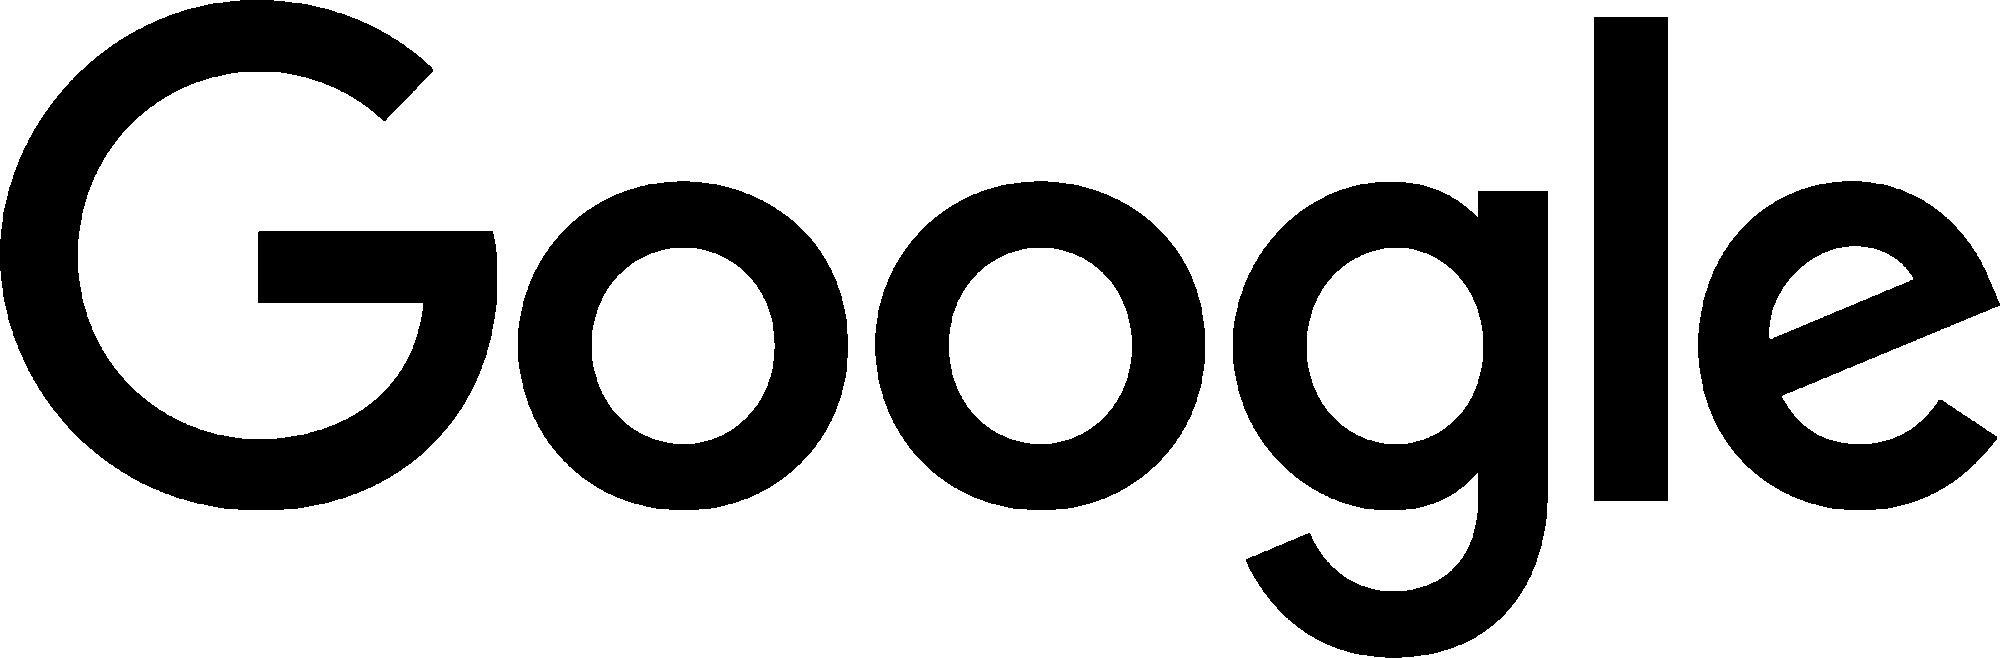 Google black logo PNG.